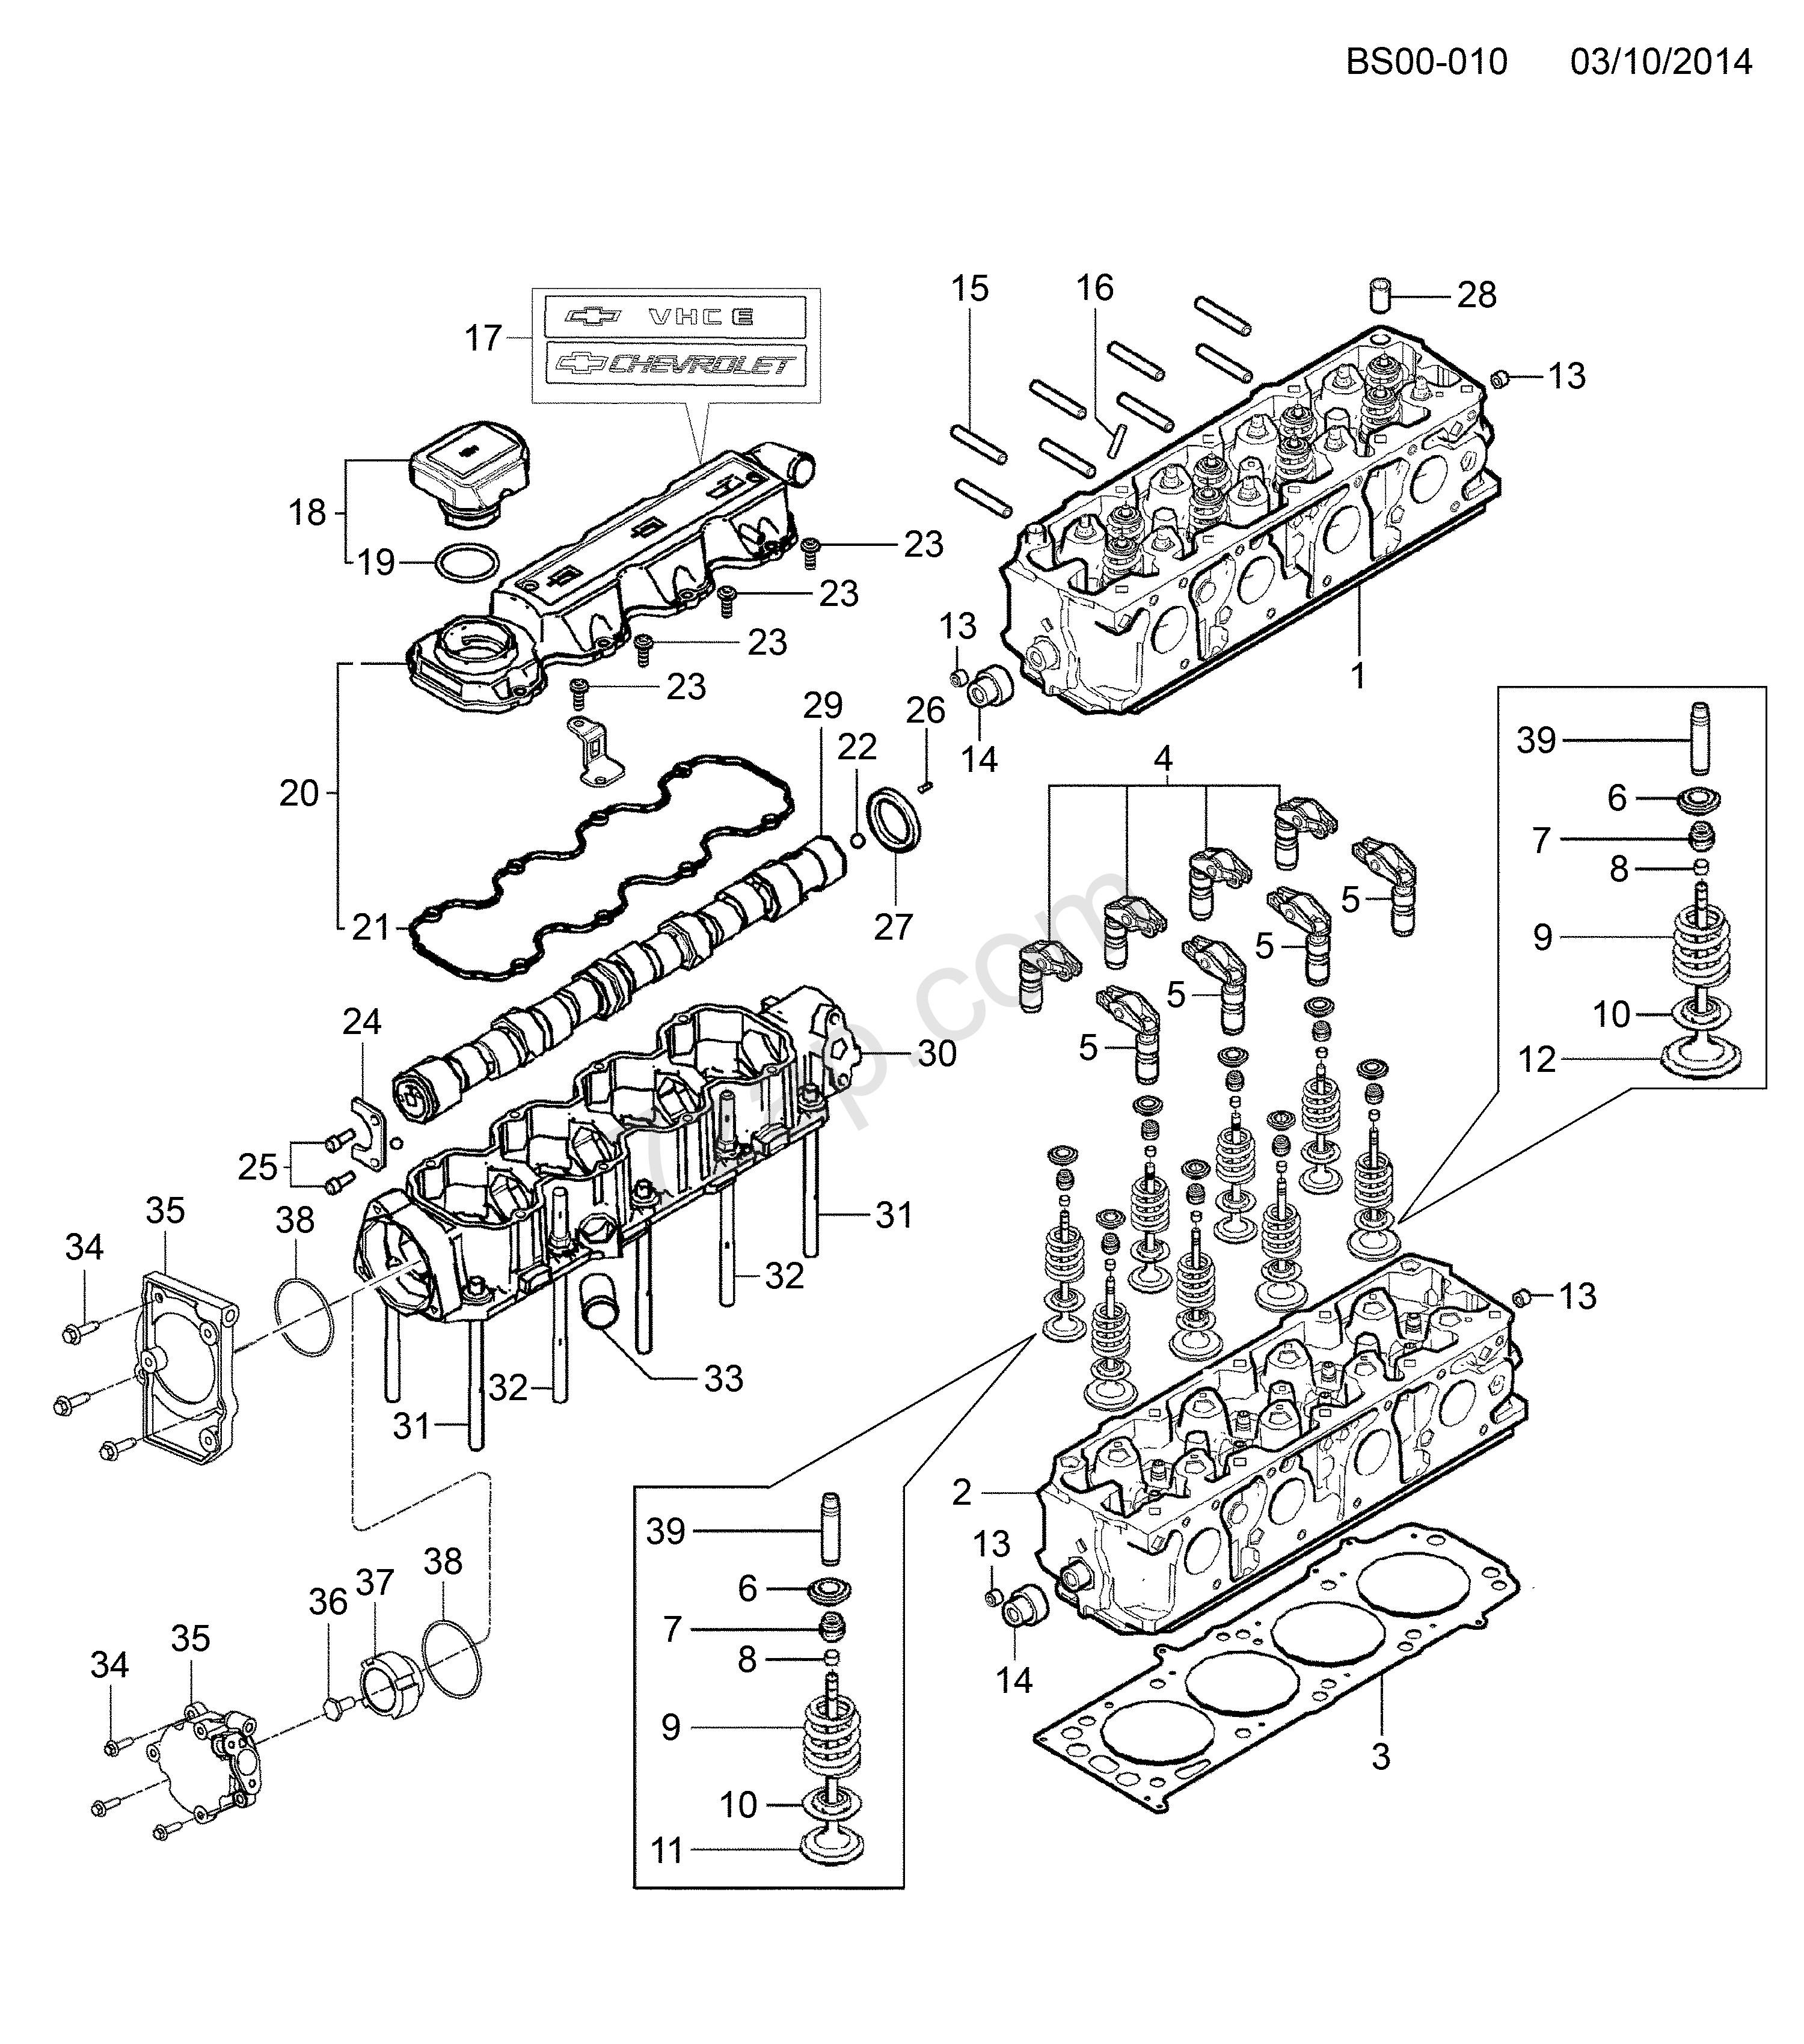 6 cylinder engine diagram 2011 2017 s19 cylinder head chevrolet corsa corsa of 6 cylinder engine